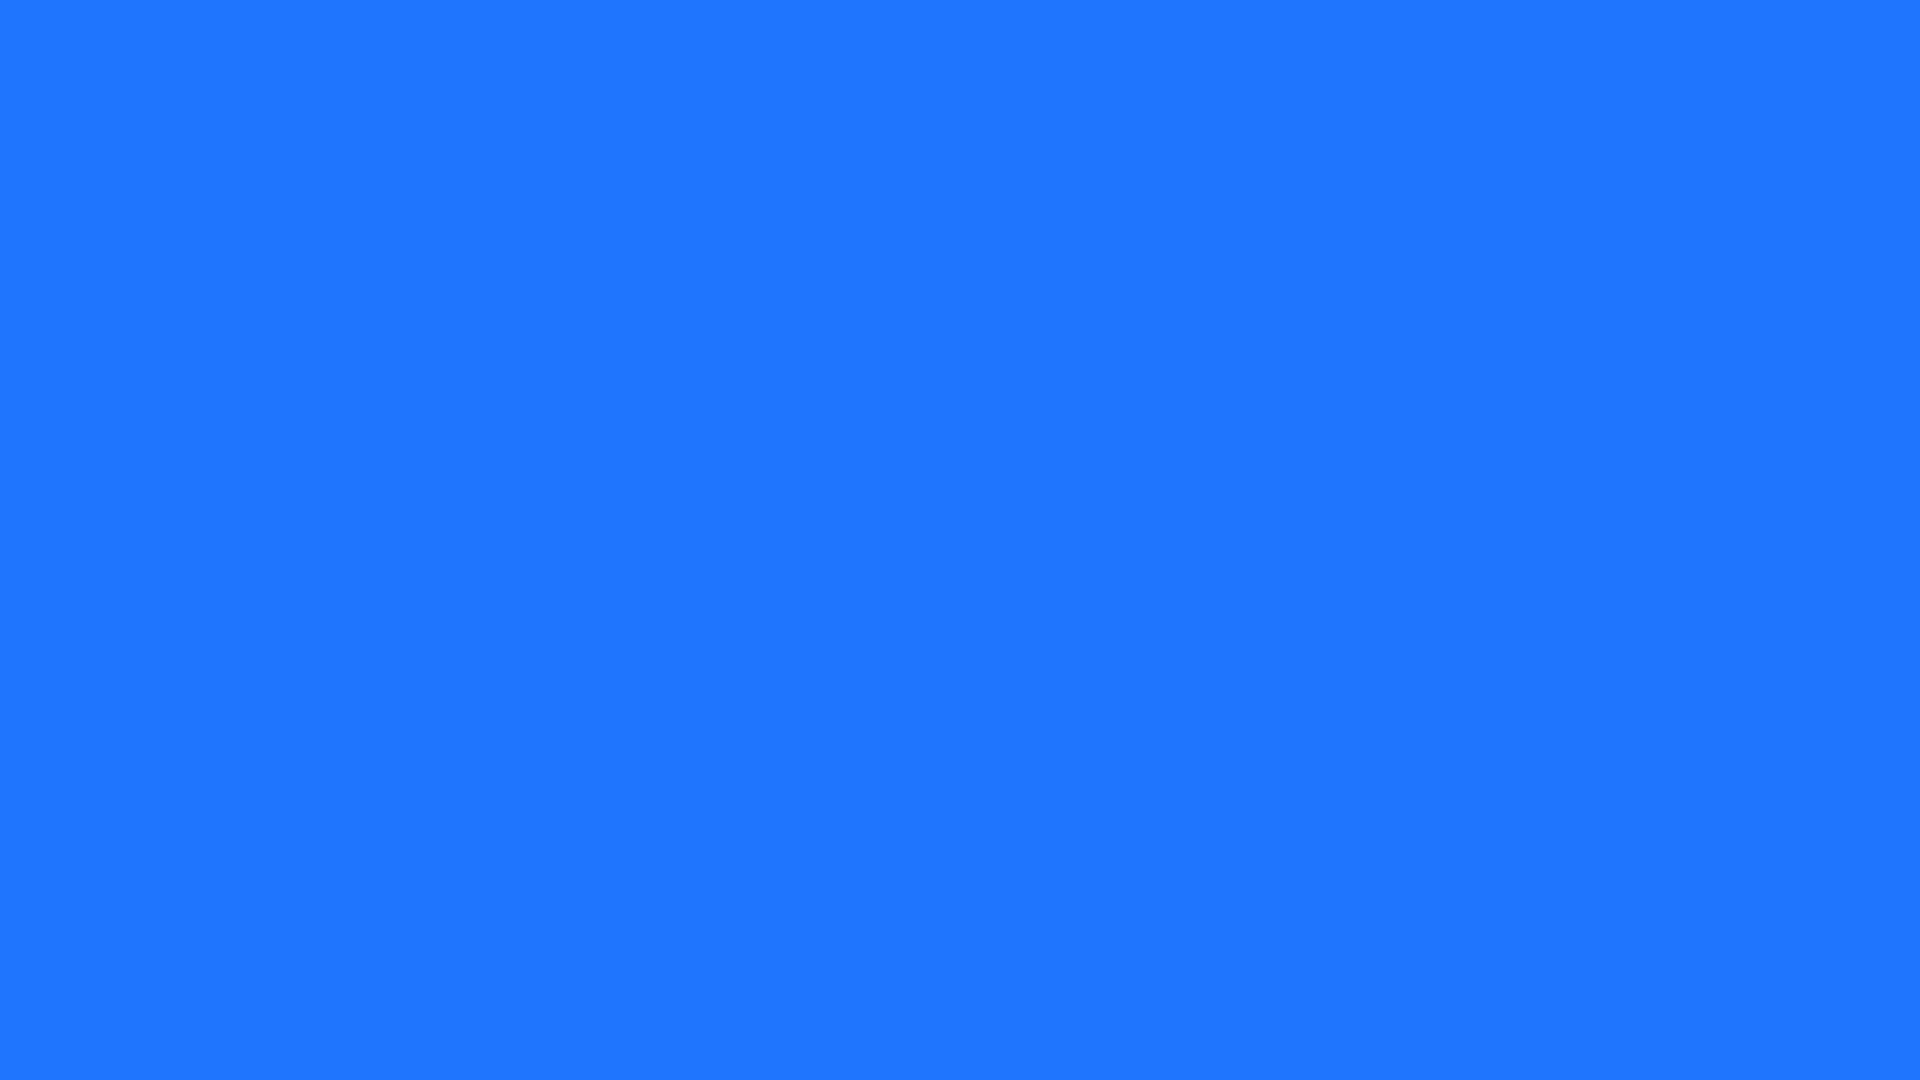 1920x1080 Blue Crayola Solid Color Background